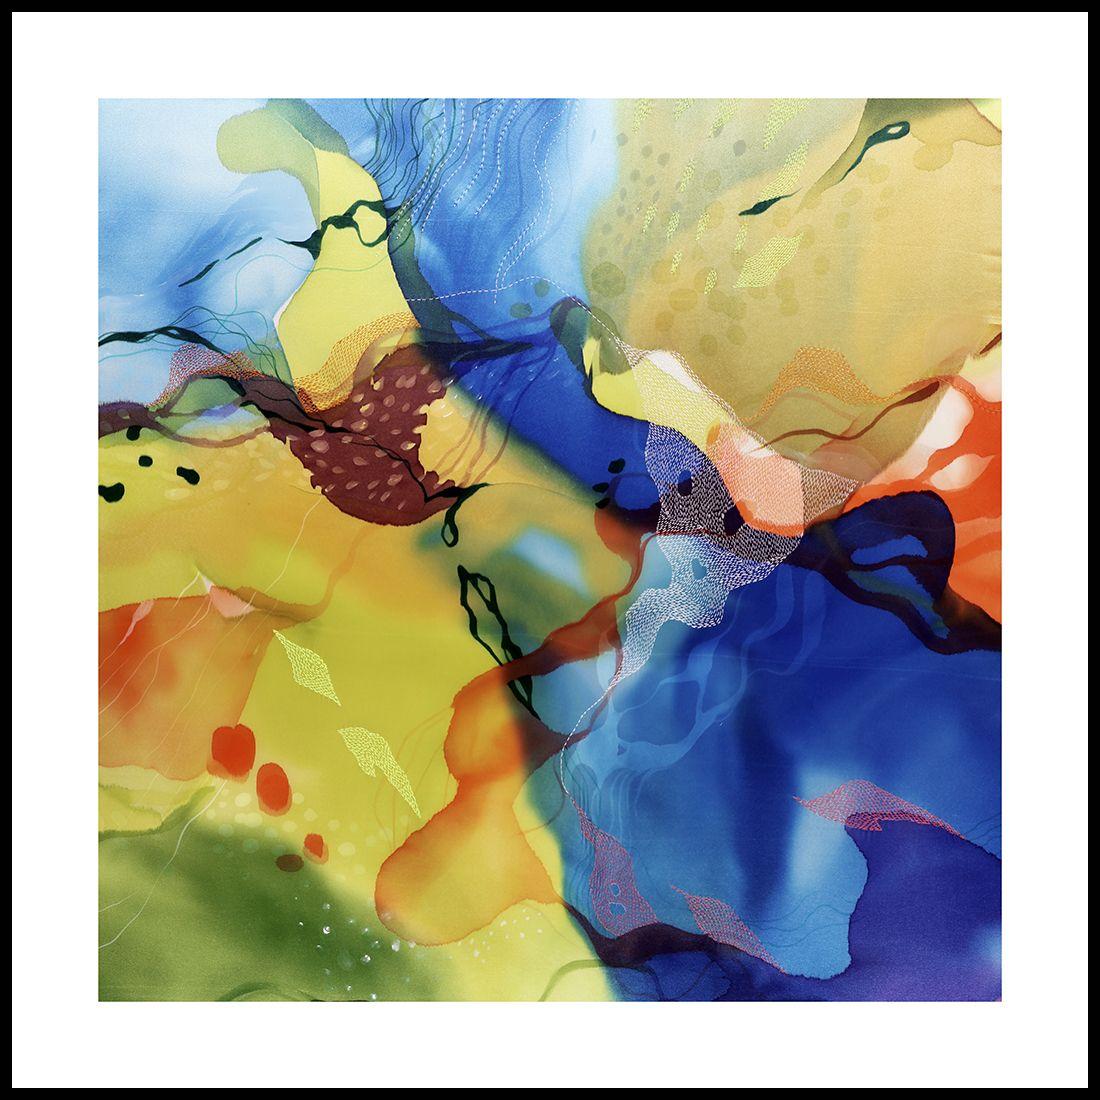 John Martono \'Evening\' | Framed Print or Canvas | The Block Shop ...